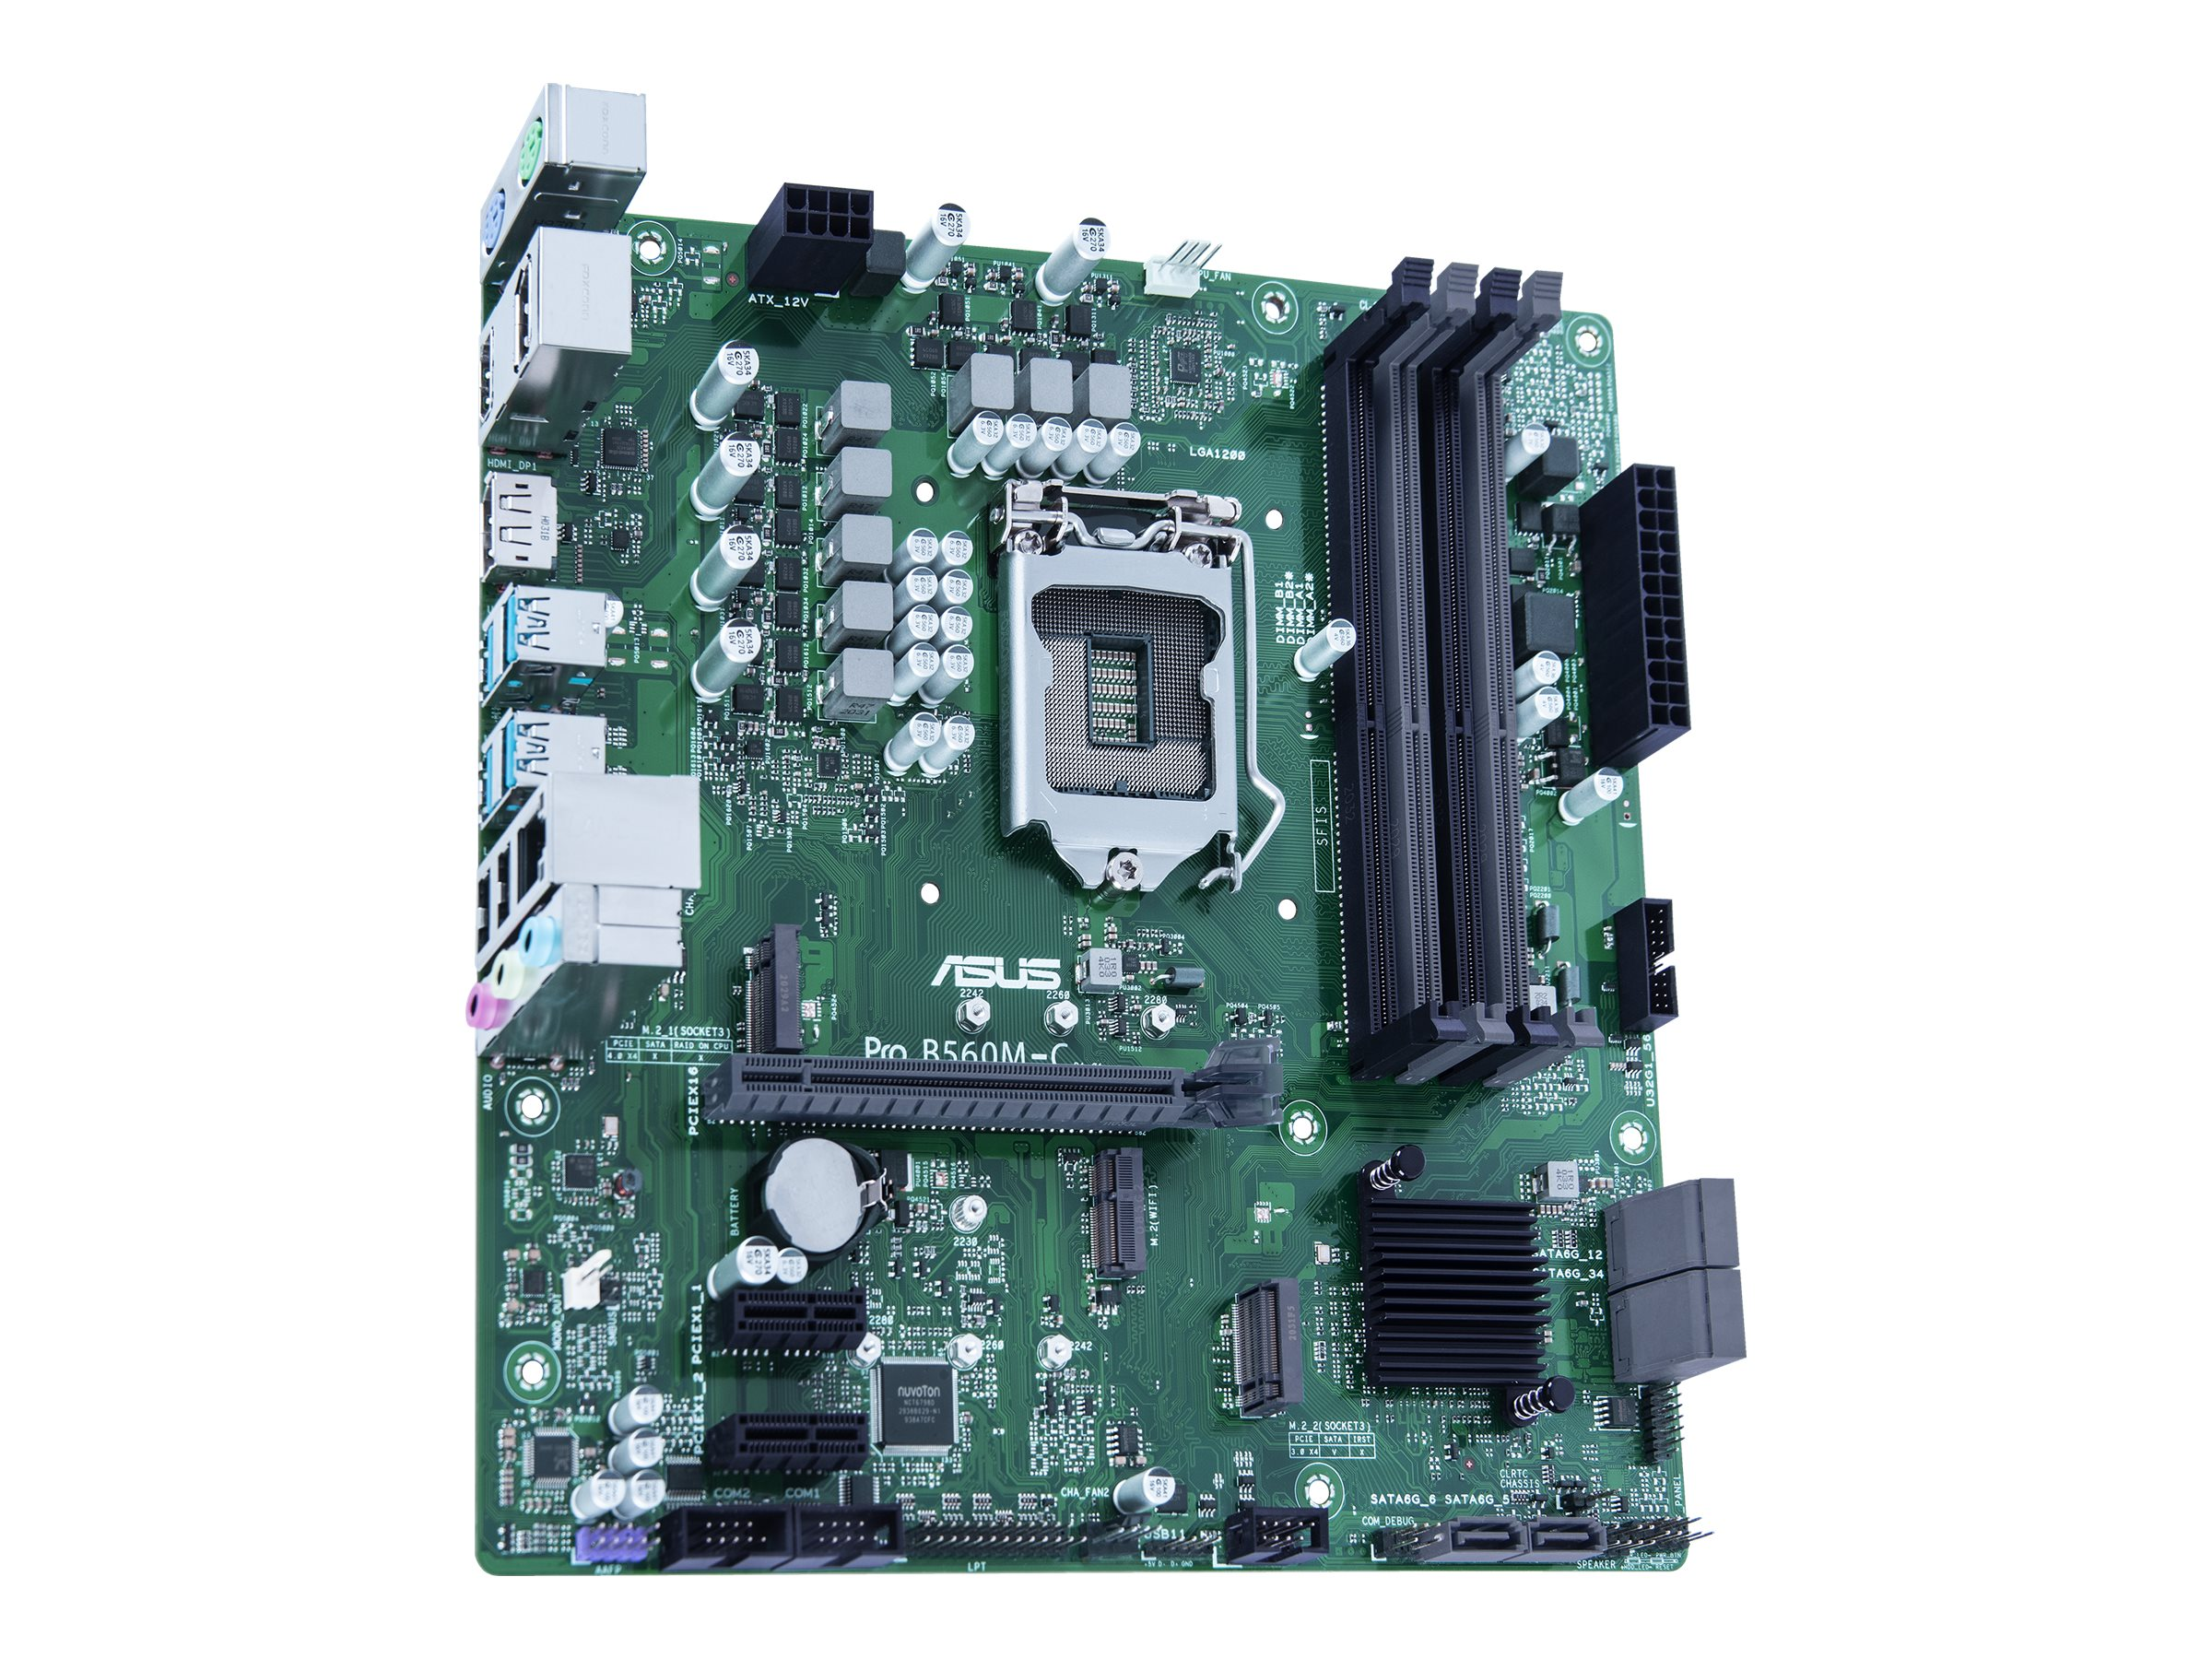 ASUS Pro B560M-C/CSM - Motherboard - micro ATX - LGA1200-Sockel - B560 - USB 3.2 Gen 1 - Gigabit LAN - Onboard-Grafik (CPU erforderlich)